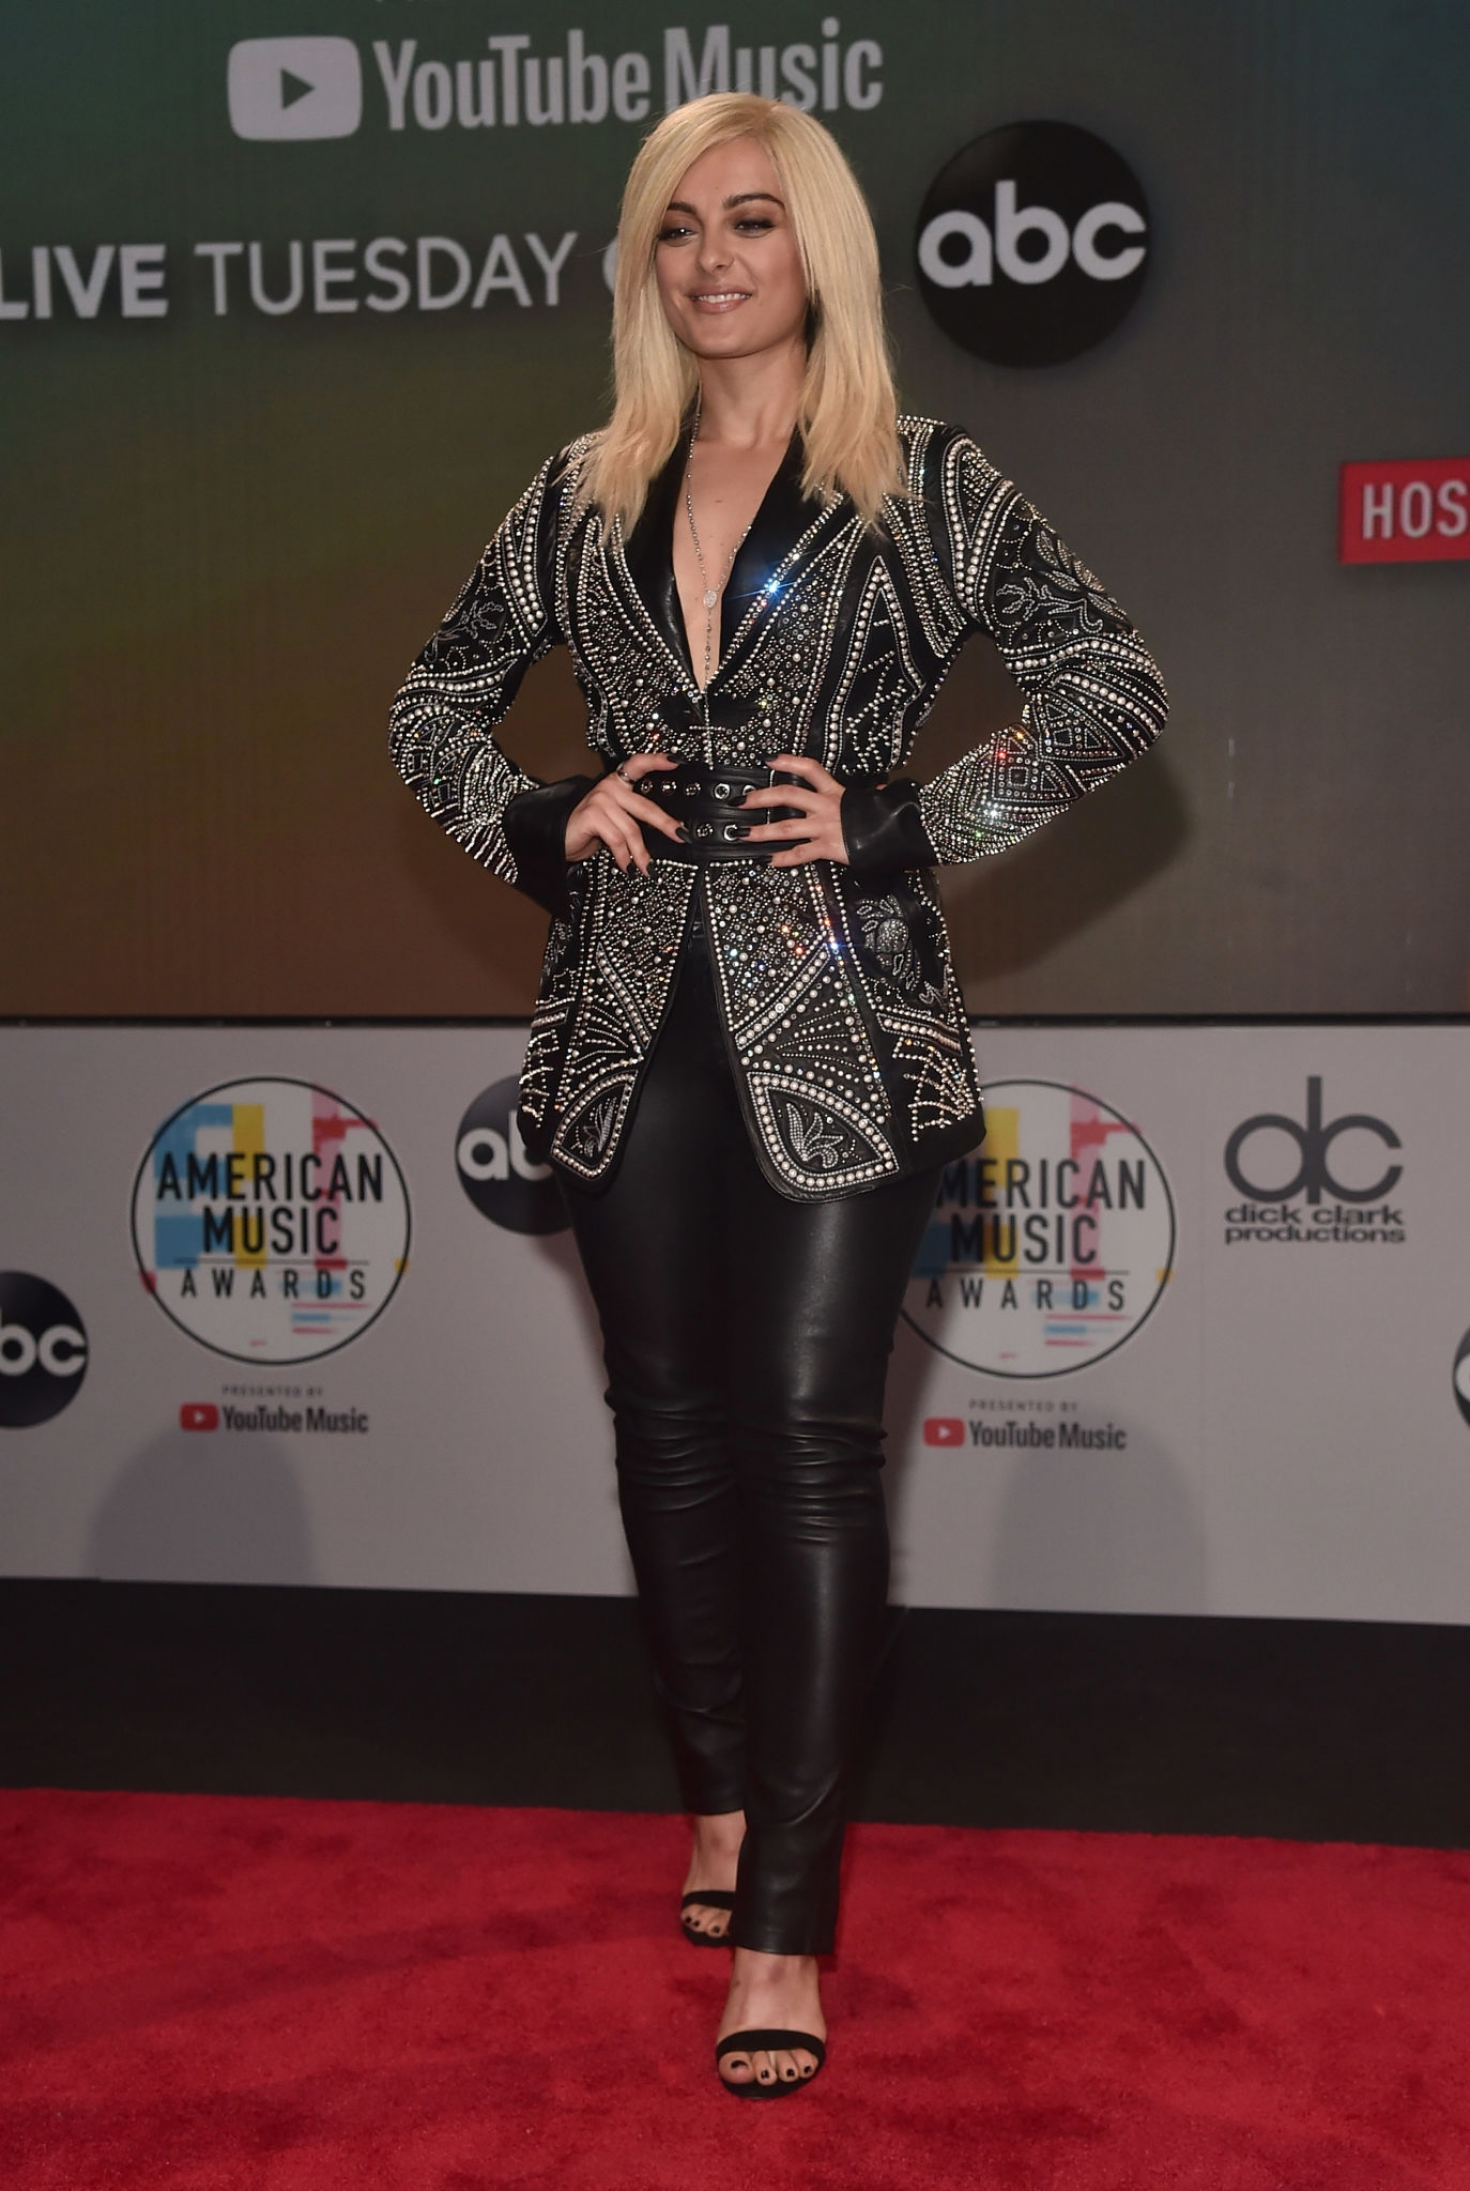 Bebe Rexha 2018 : Bebe Rexha: 2018 American Music Awards Nominations Announcement -07